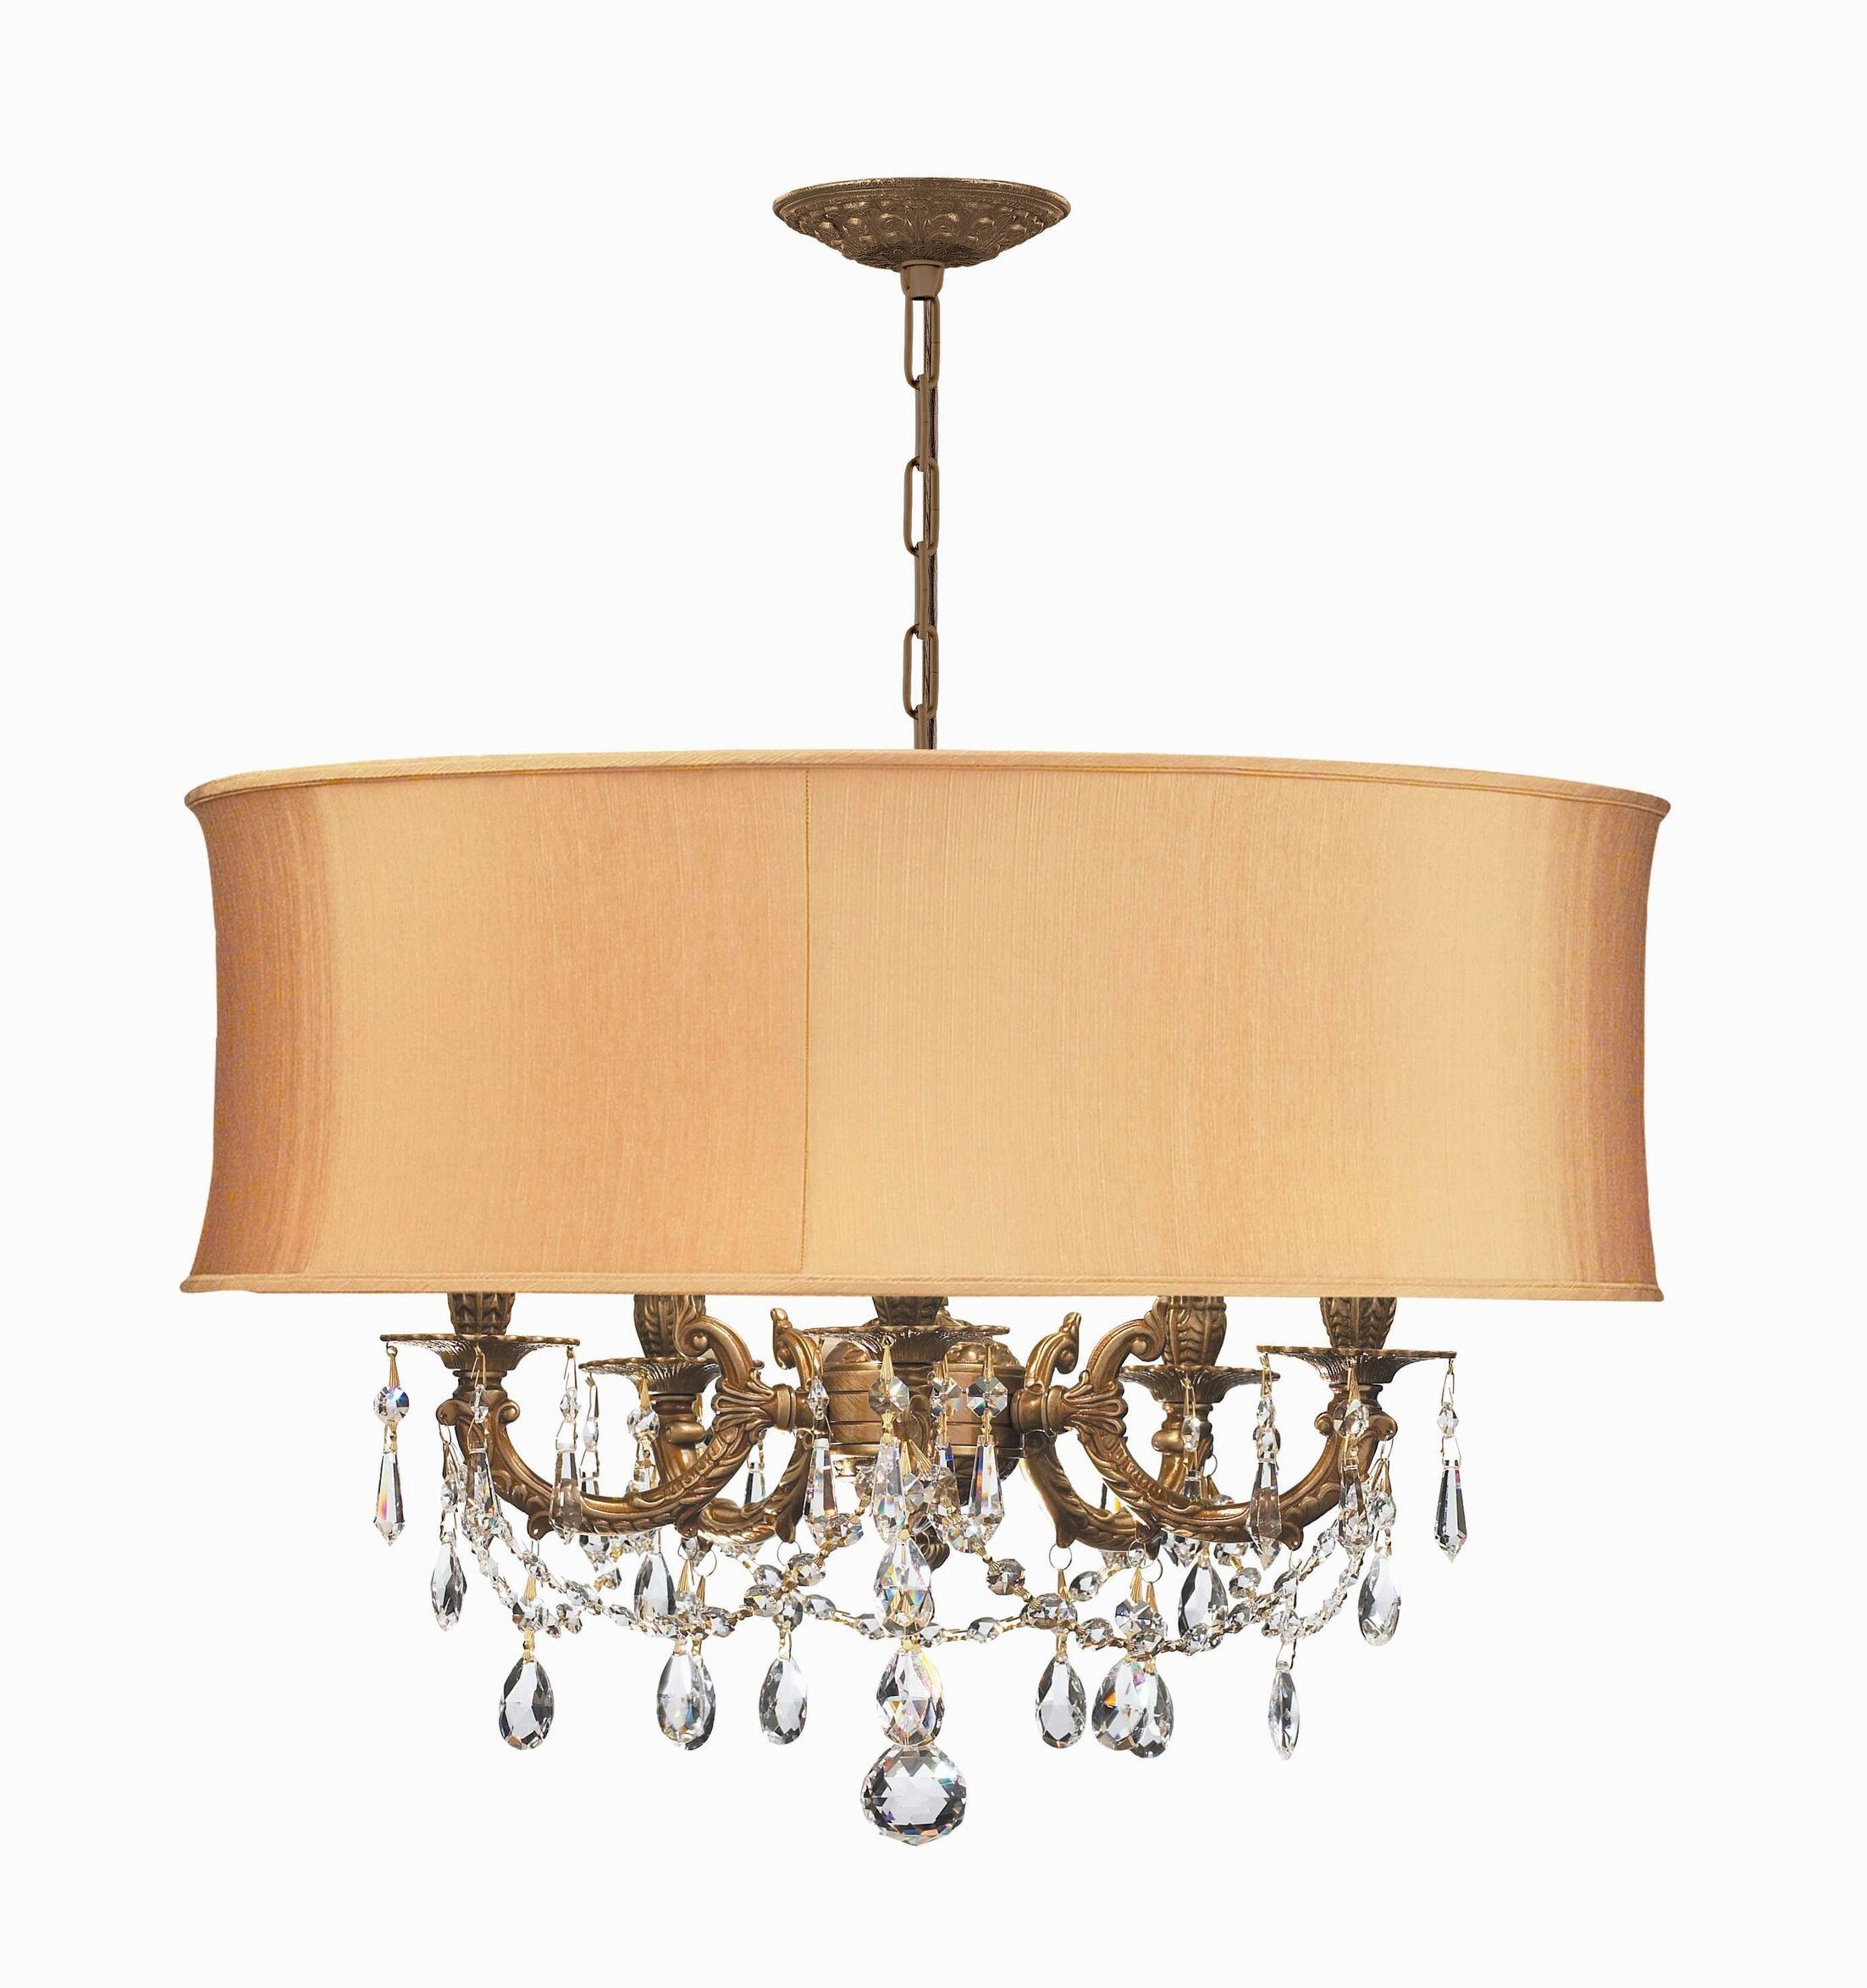 Corrinne Modern 5-Light Chandelier Finish: Aged Brass, Crystal Type: Golden Teak Hand Polished, Shade: Harvest Gold